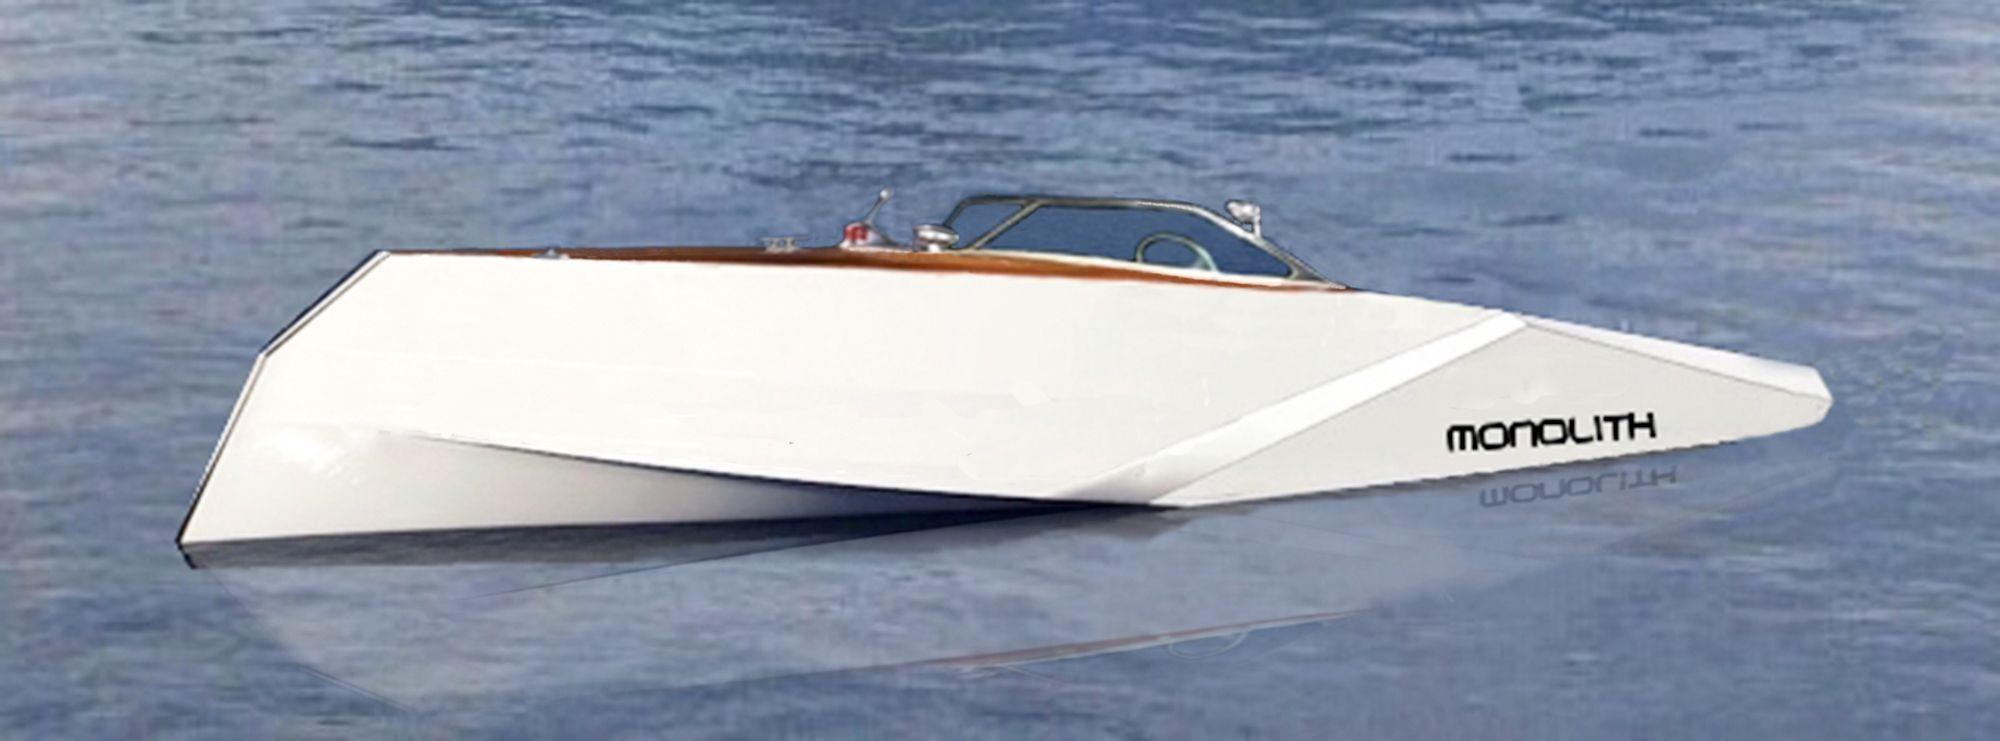 Superyachten concept  Superyacht design concept,Superyacht,conceptual boat,conceptual ...